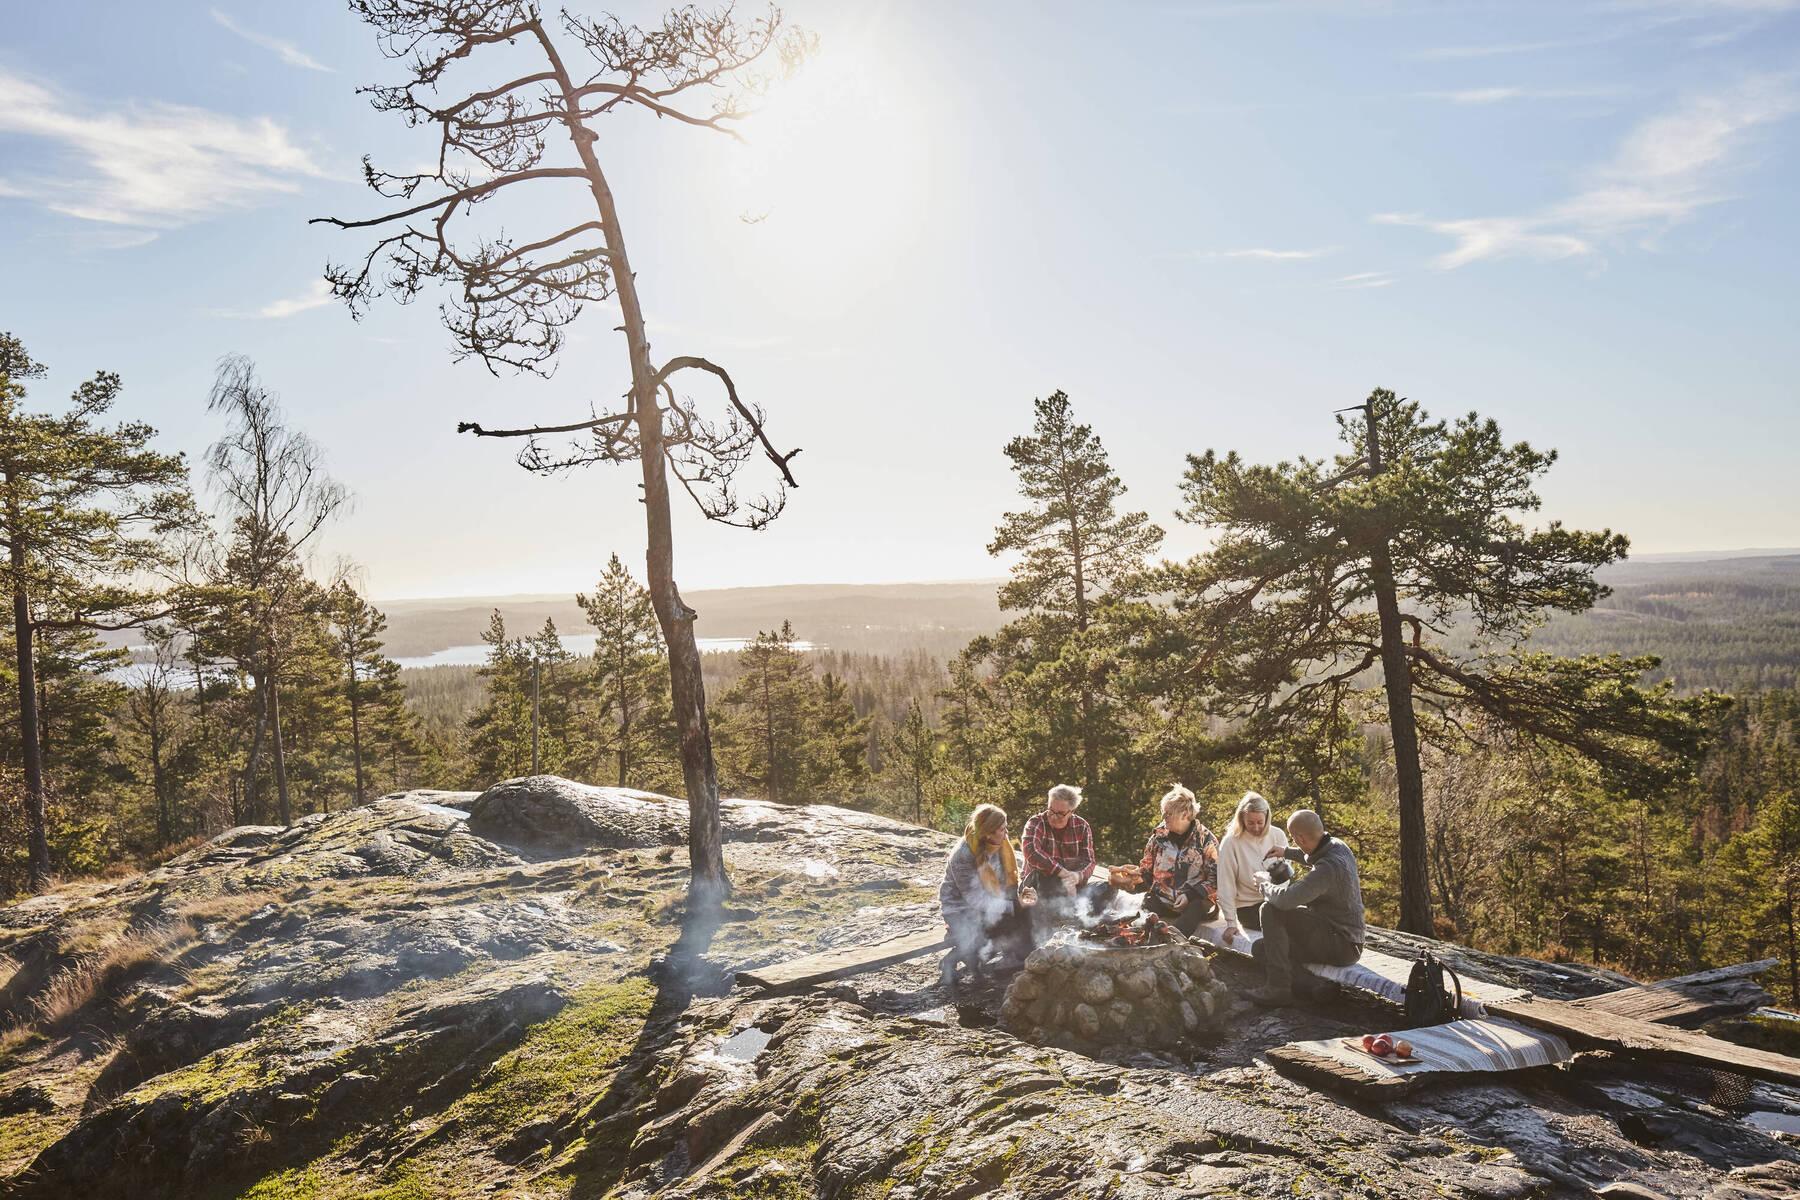 Campfire at Skuruhatt, Småland, Sweden